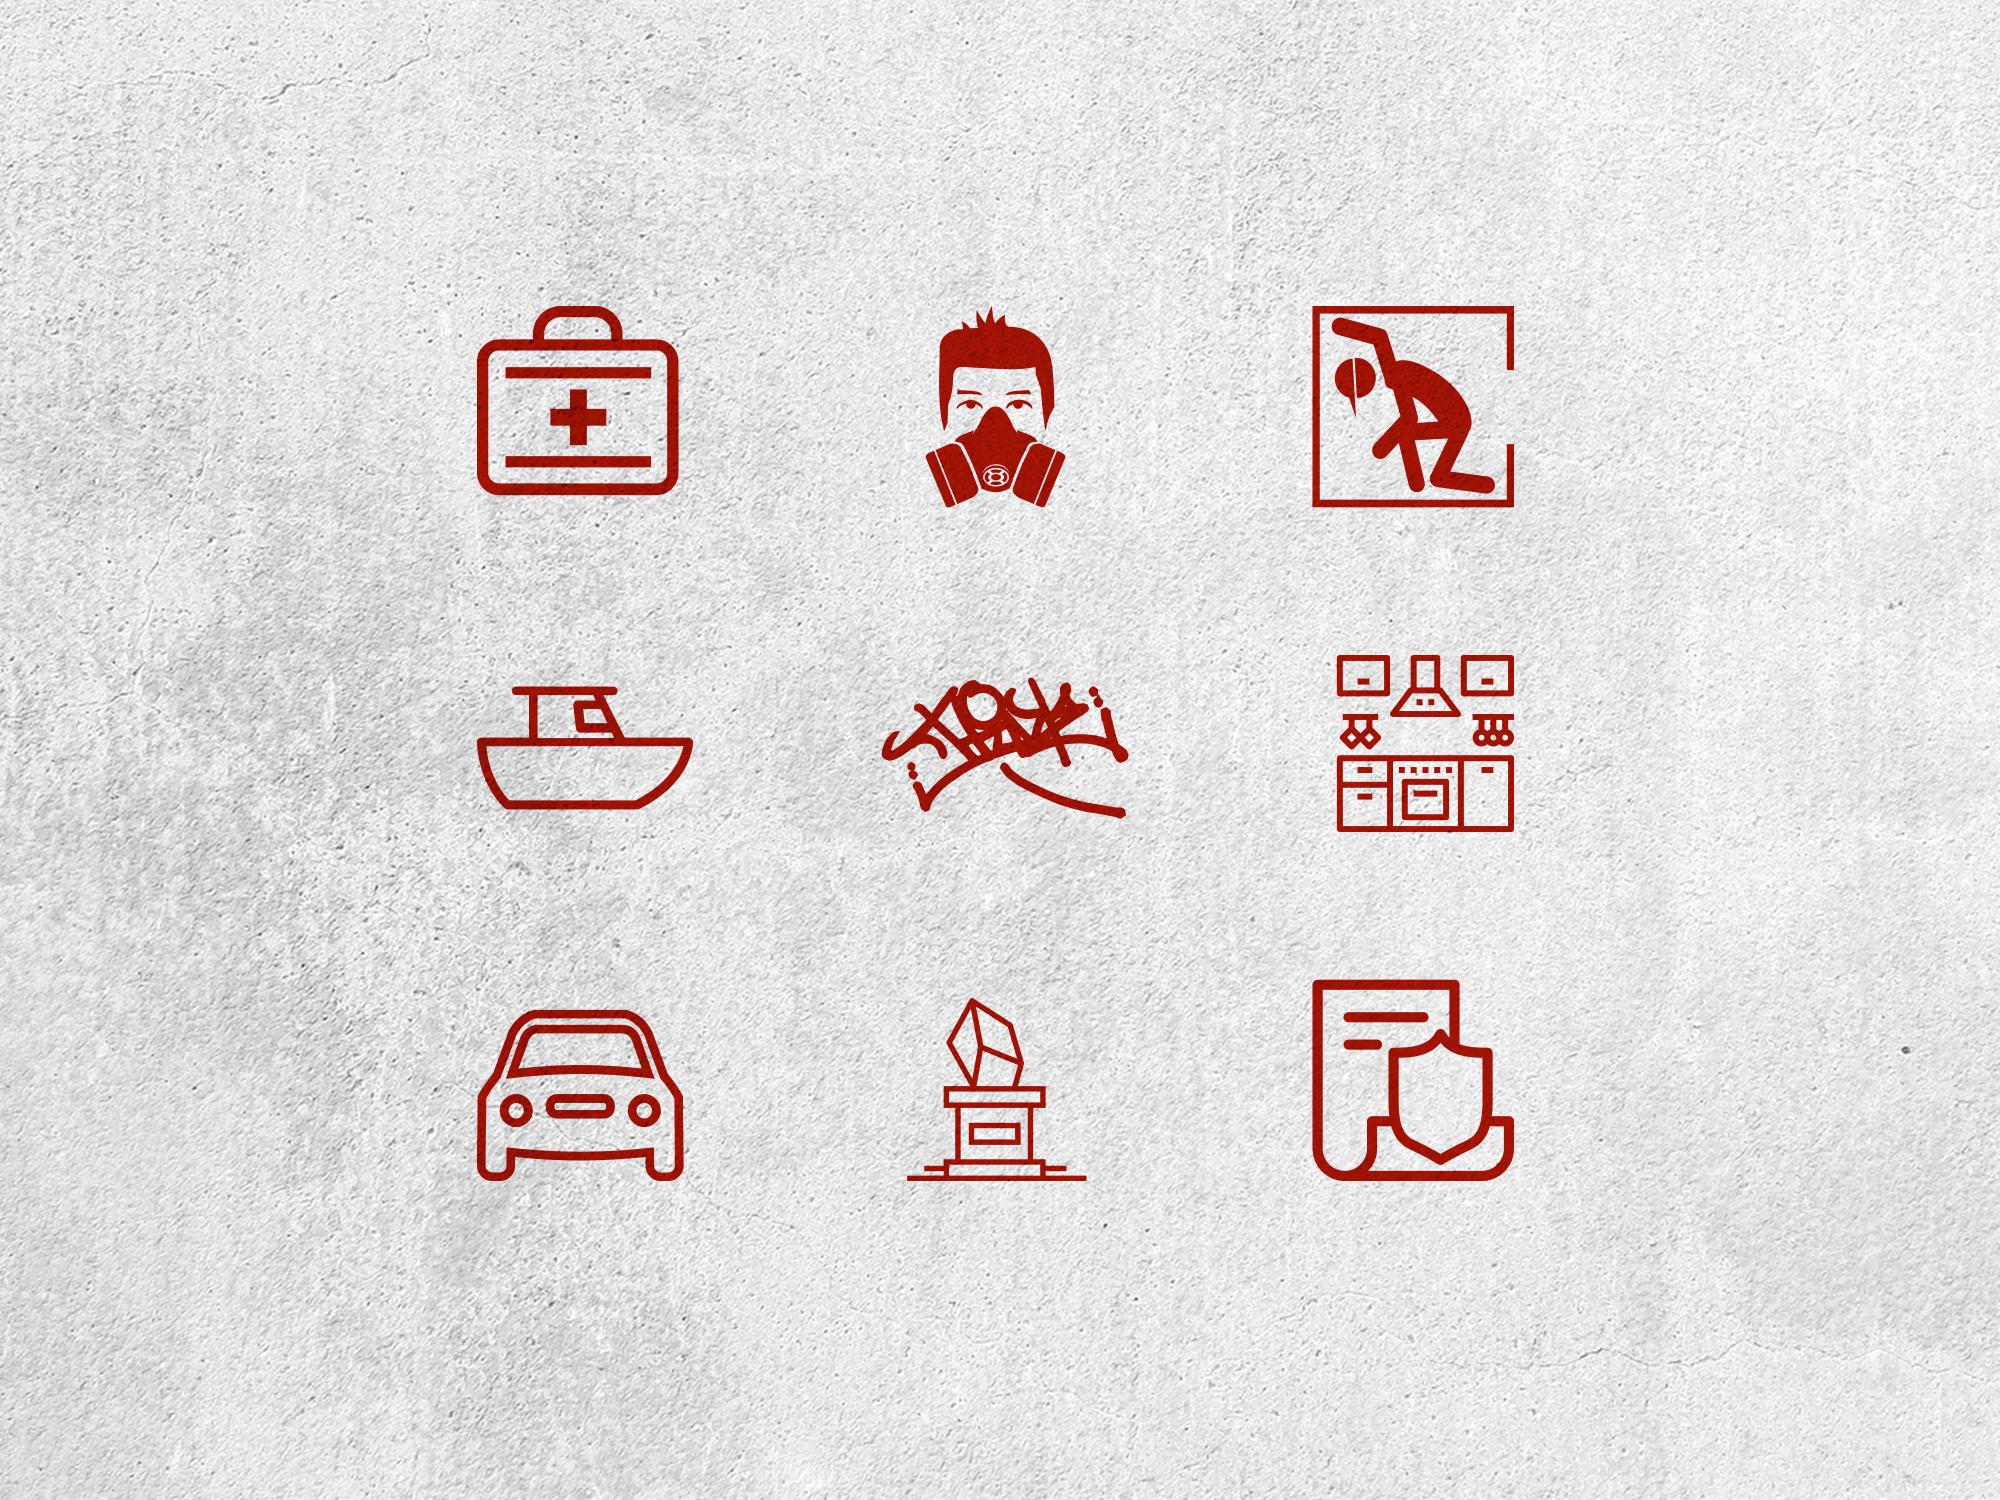 Custom designed icons for website.